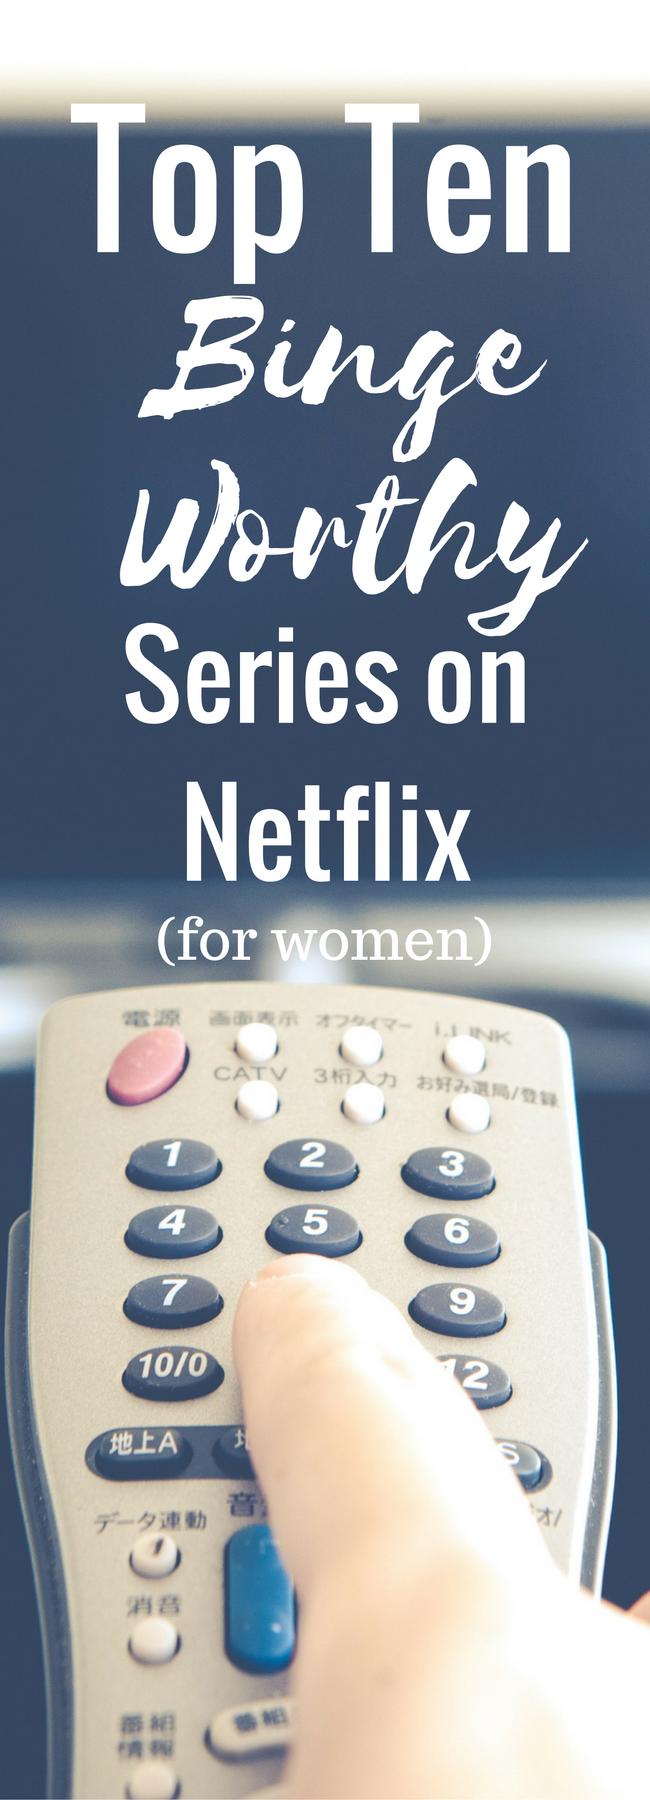 Top 10 Binge Worthy Shows on Netflix